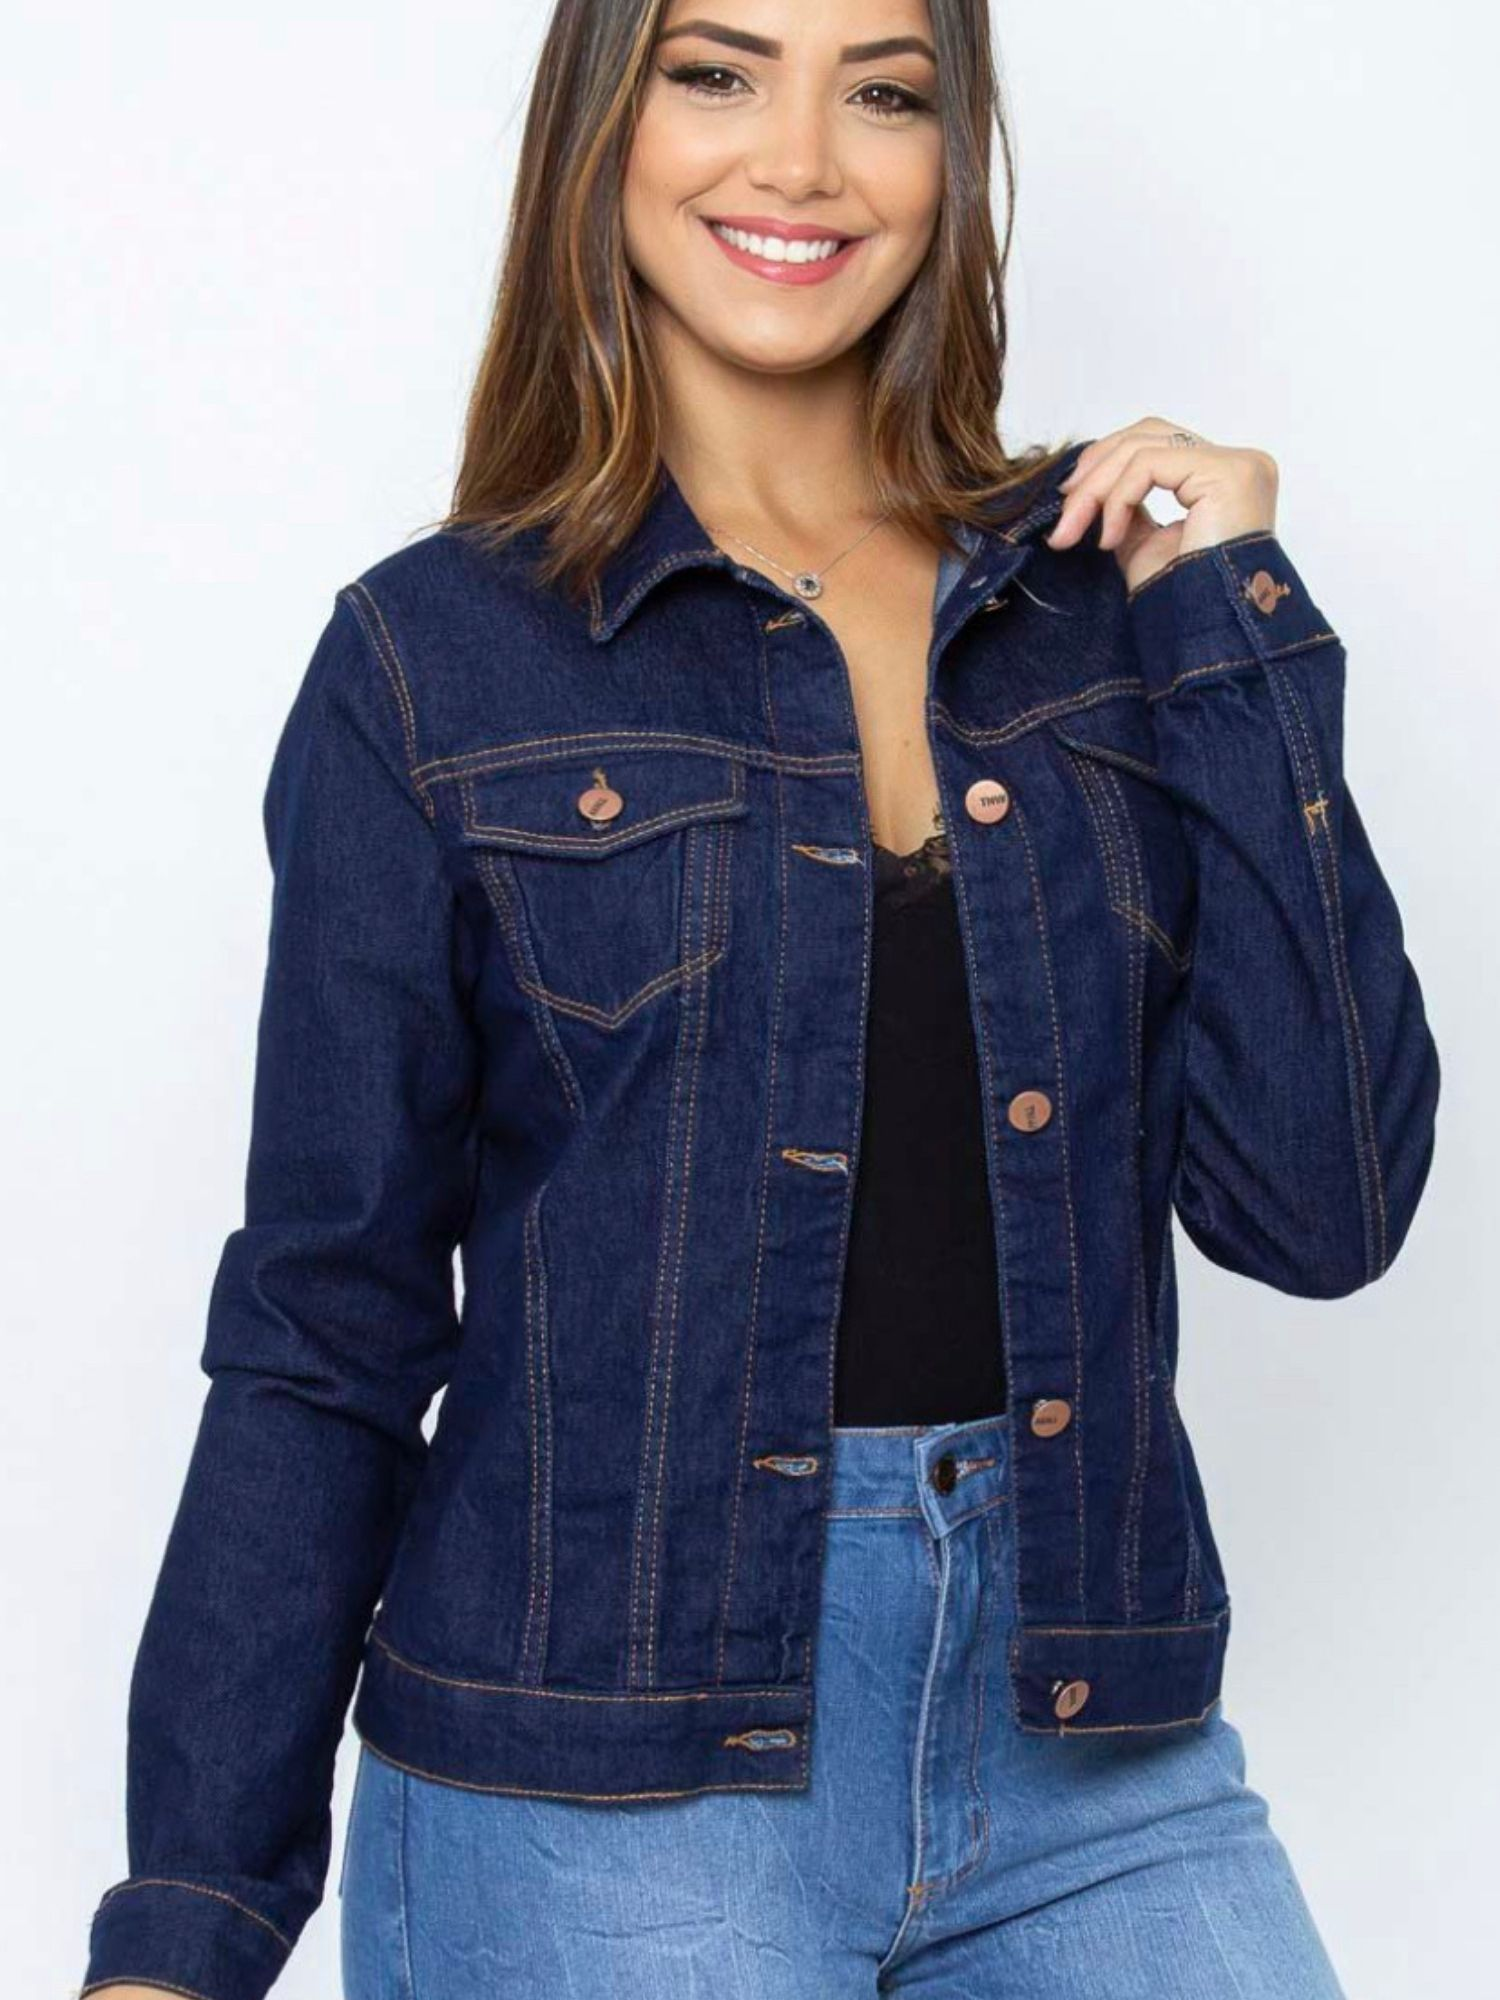 Jaqueta Feminina Jeans Tnw Jeans 52023